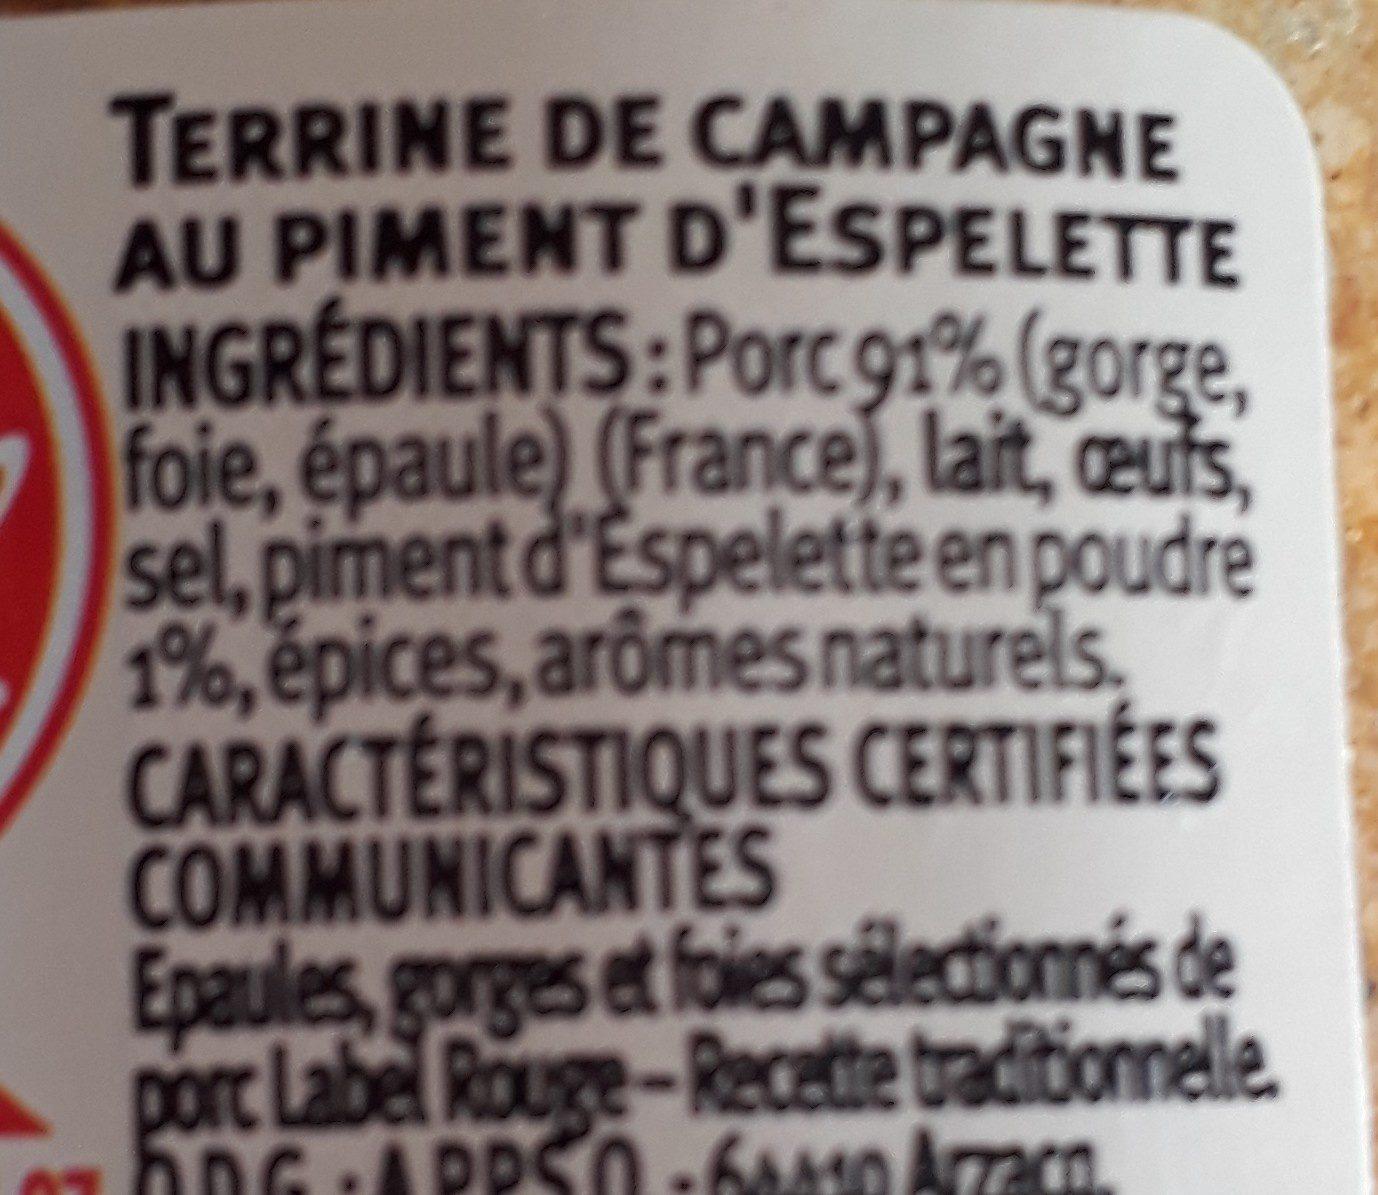 Terrine de campagne au piment d'Espelette - Ingrediënten - fr